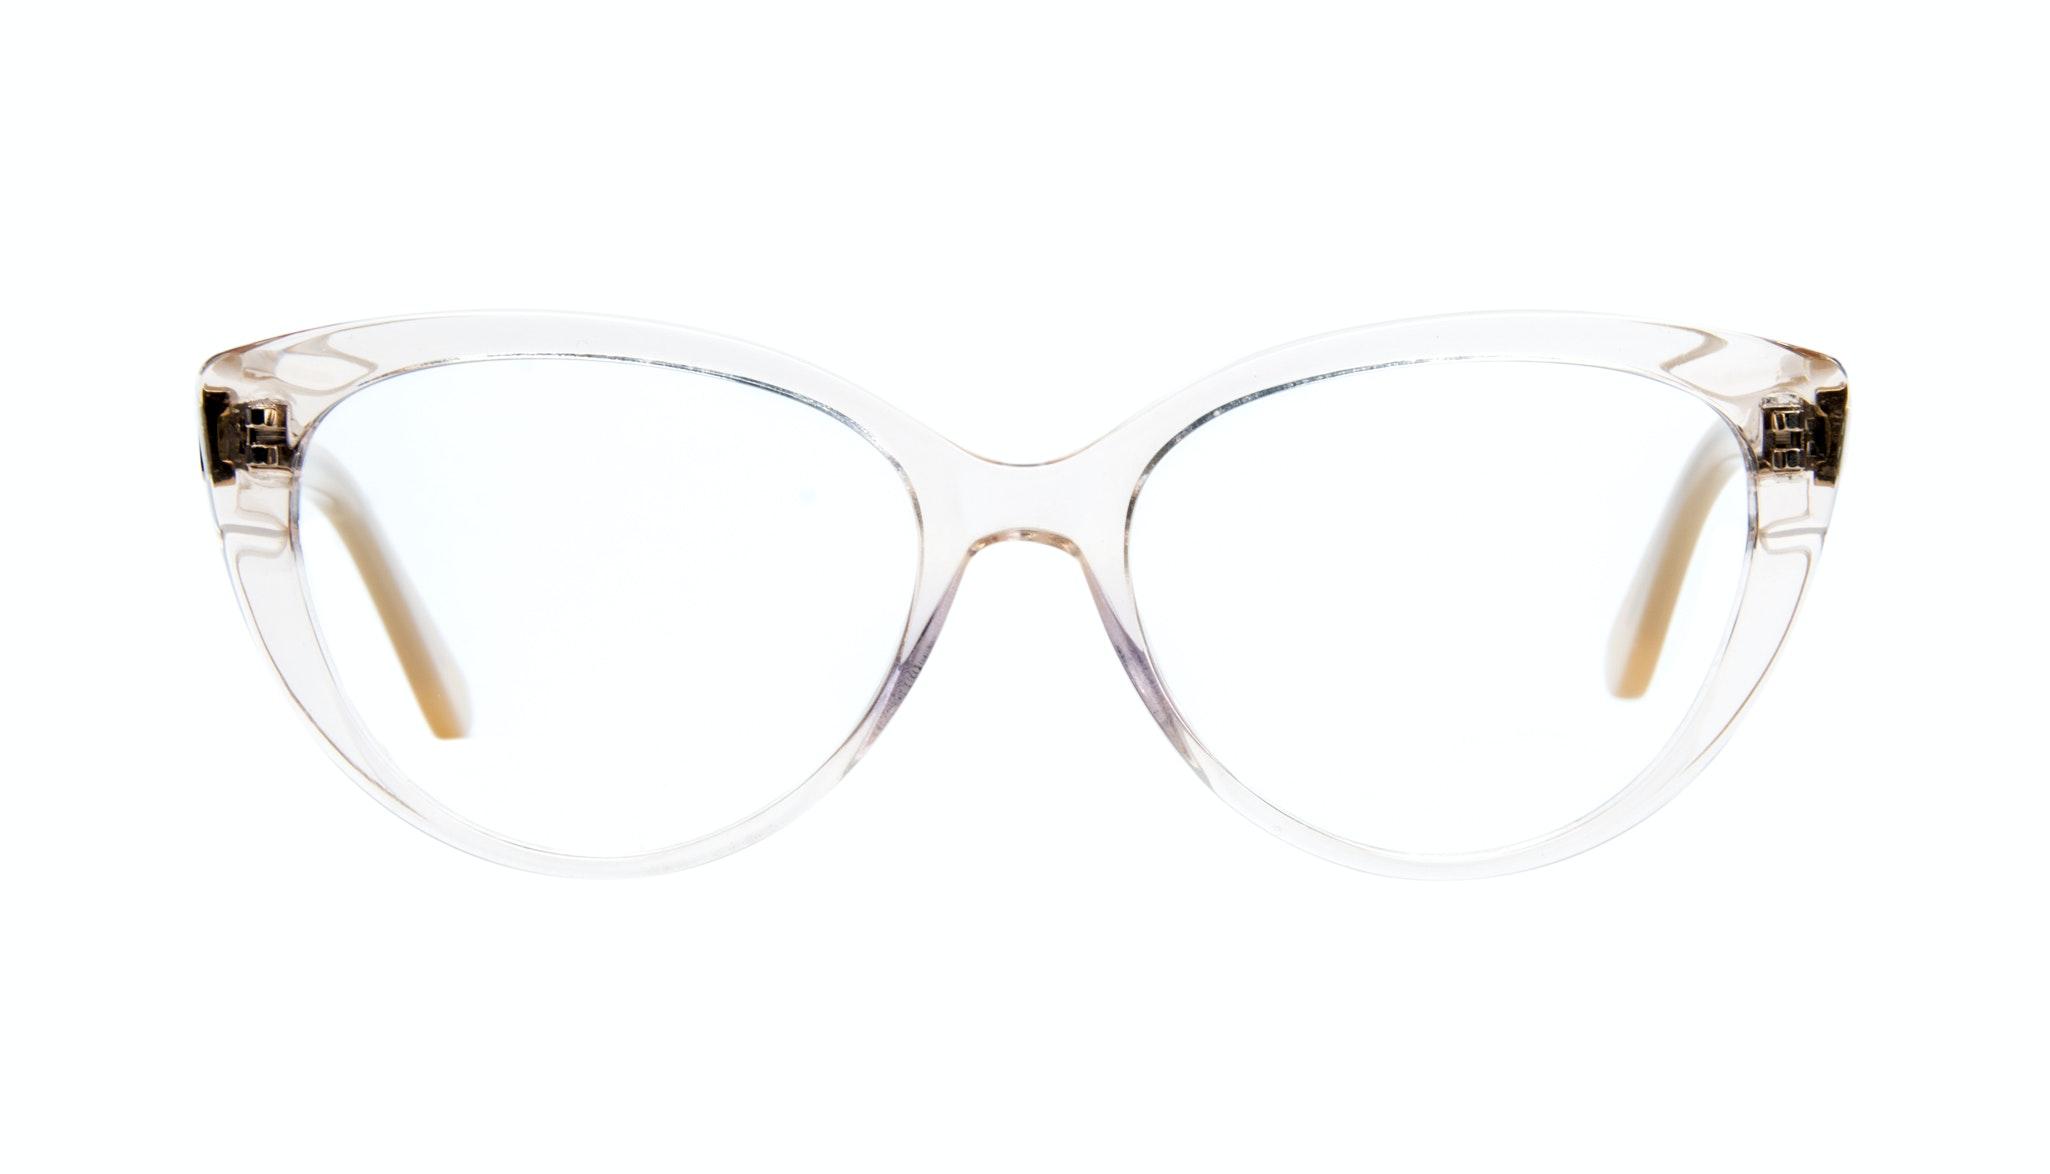 Affordable Fashion Glasses Cat Eye Eyeglasses Women Bliss Blond Metal Front